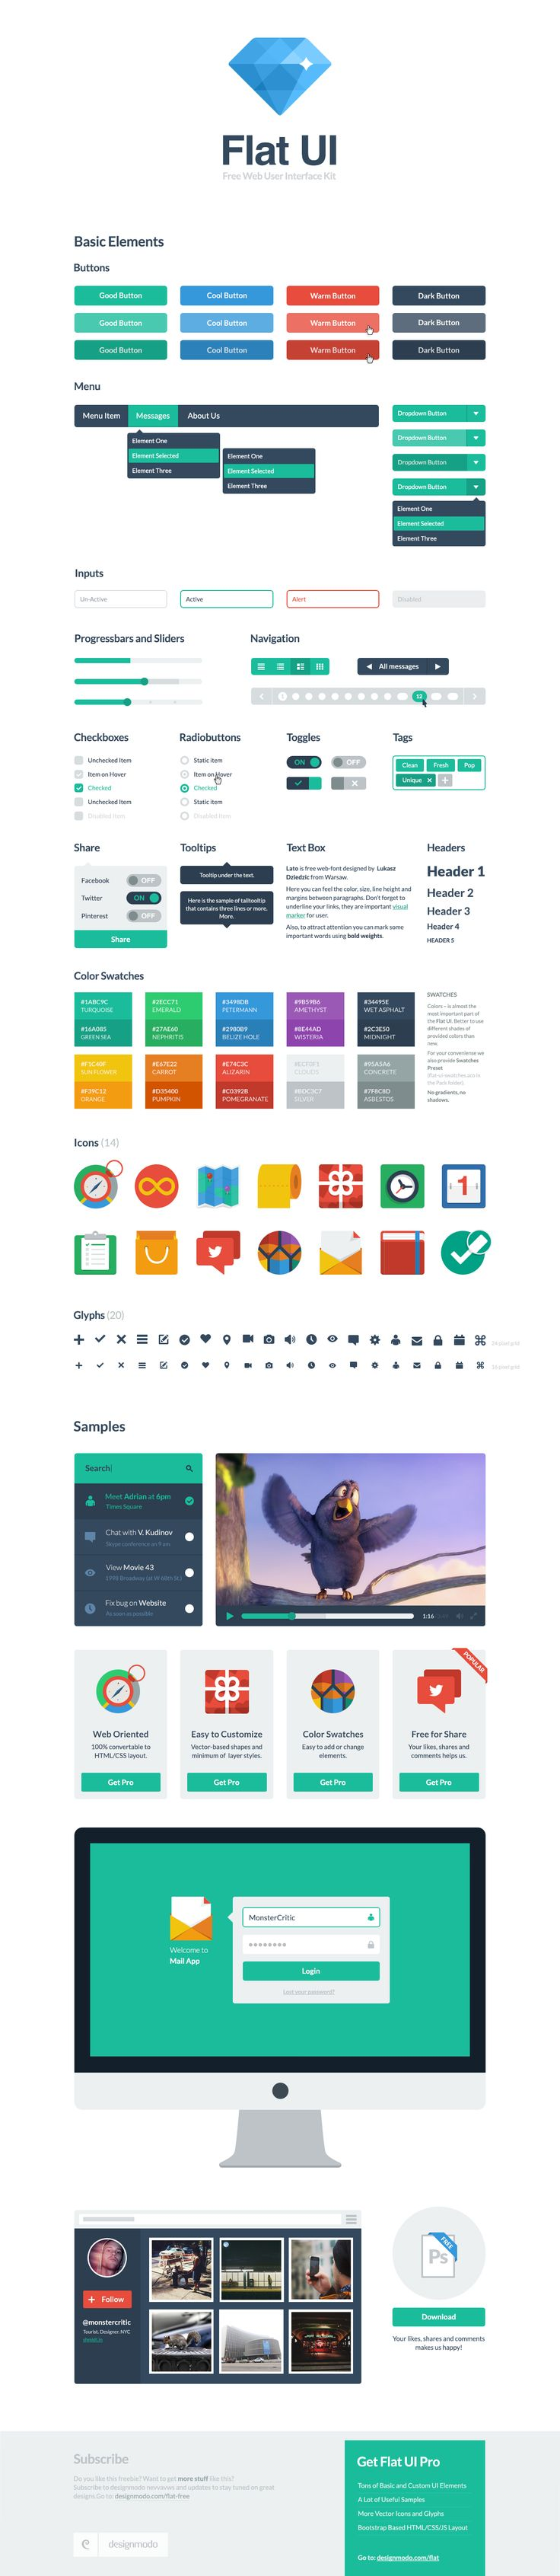 Flat UI Gratuito se basa en Twitter Bootstrap 3, con un estilo plano impresionante.